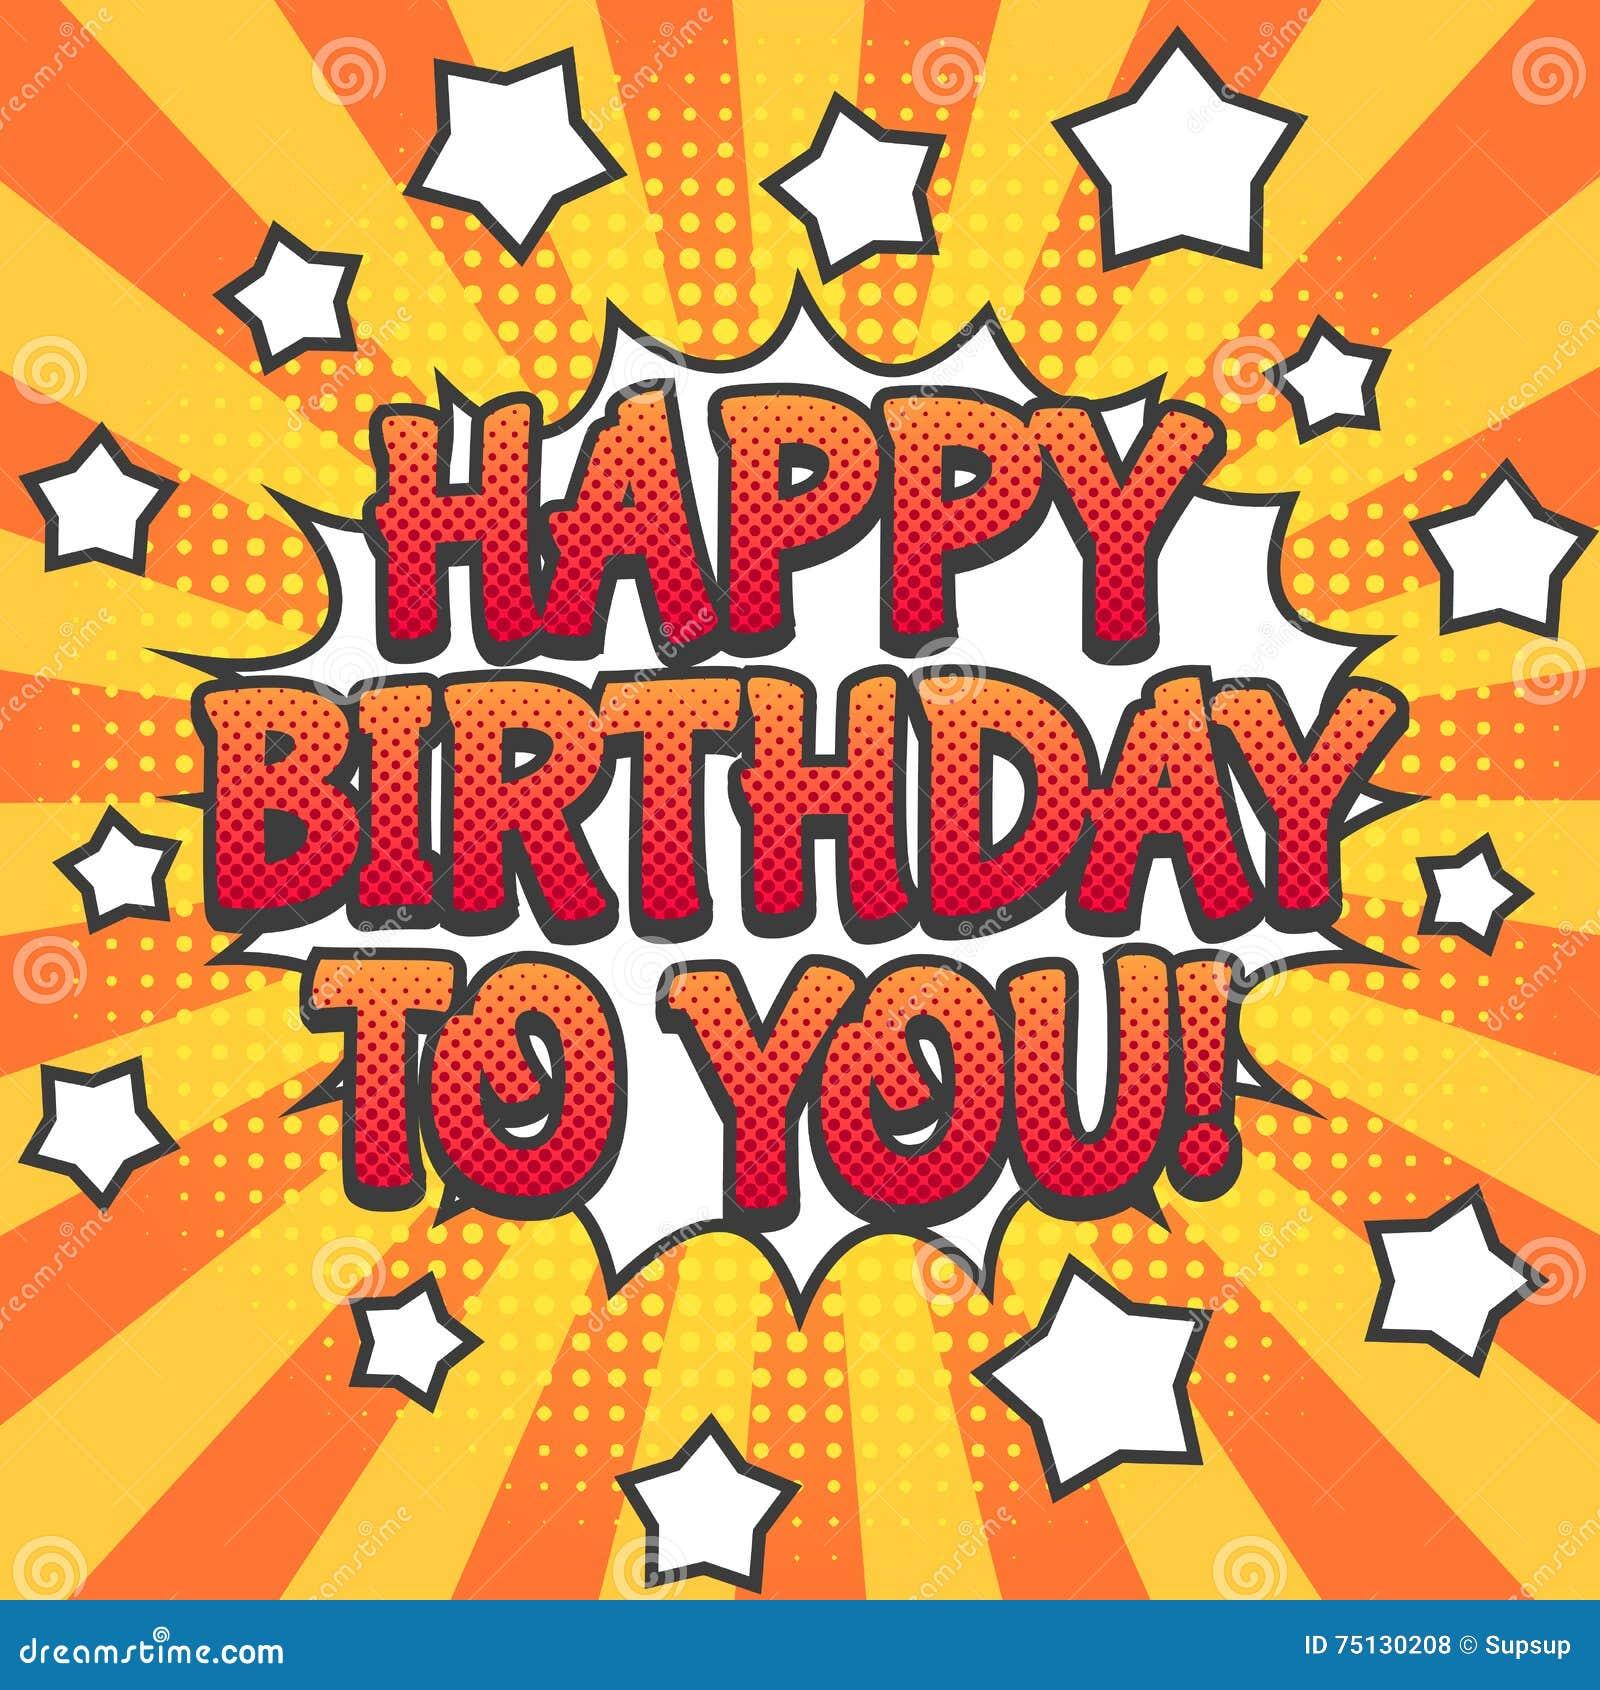 happy birthday pop Happy Birthday Pop Art Poster Stock Vector   Illustration of happy  happy birthday pop